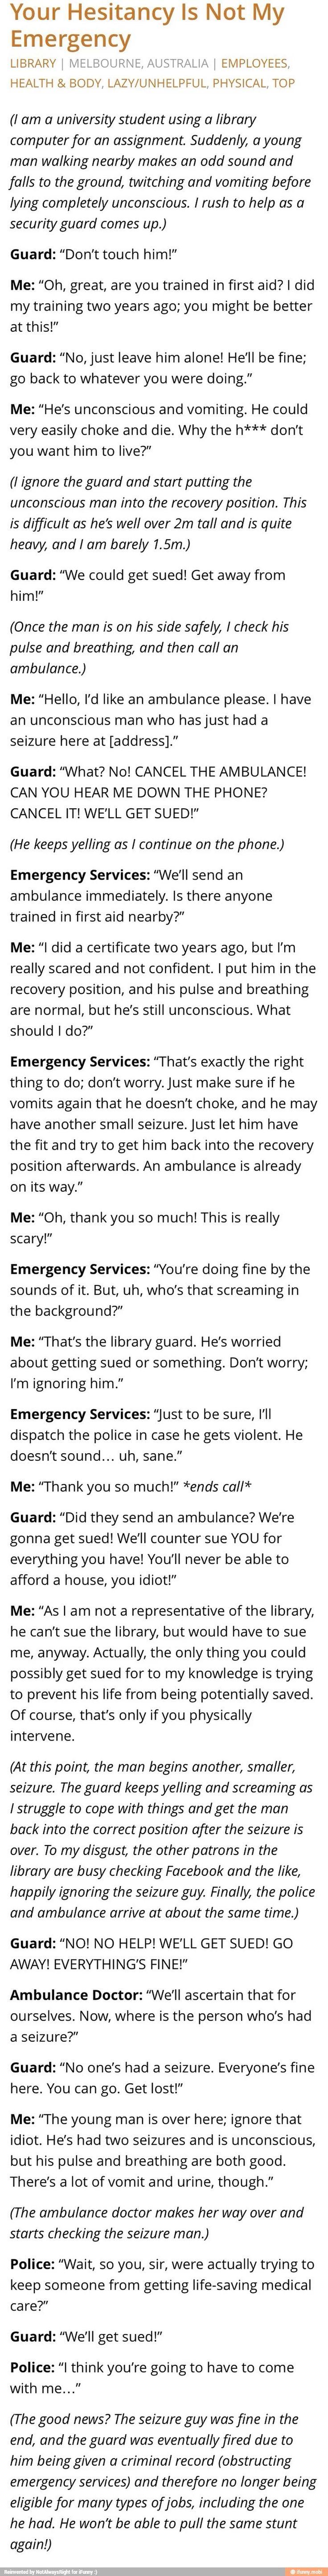 Your Hesitancy is Not My Emergency